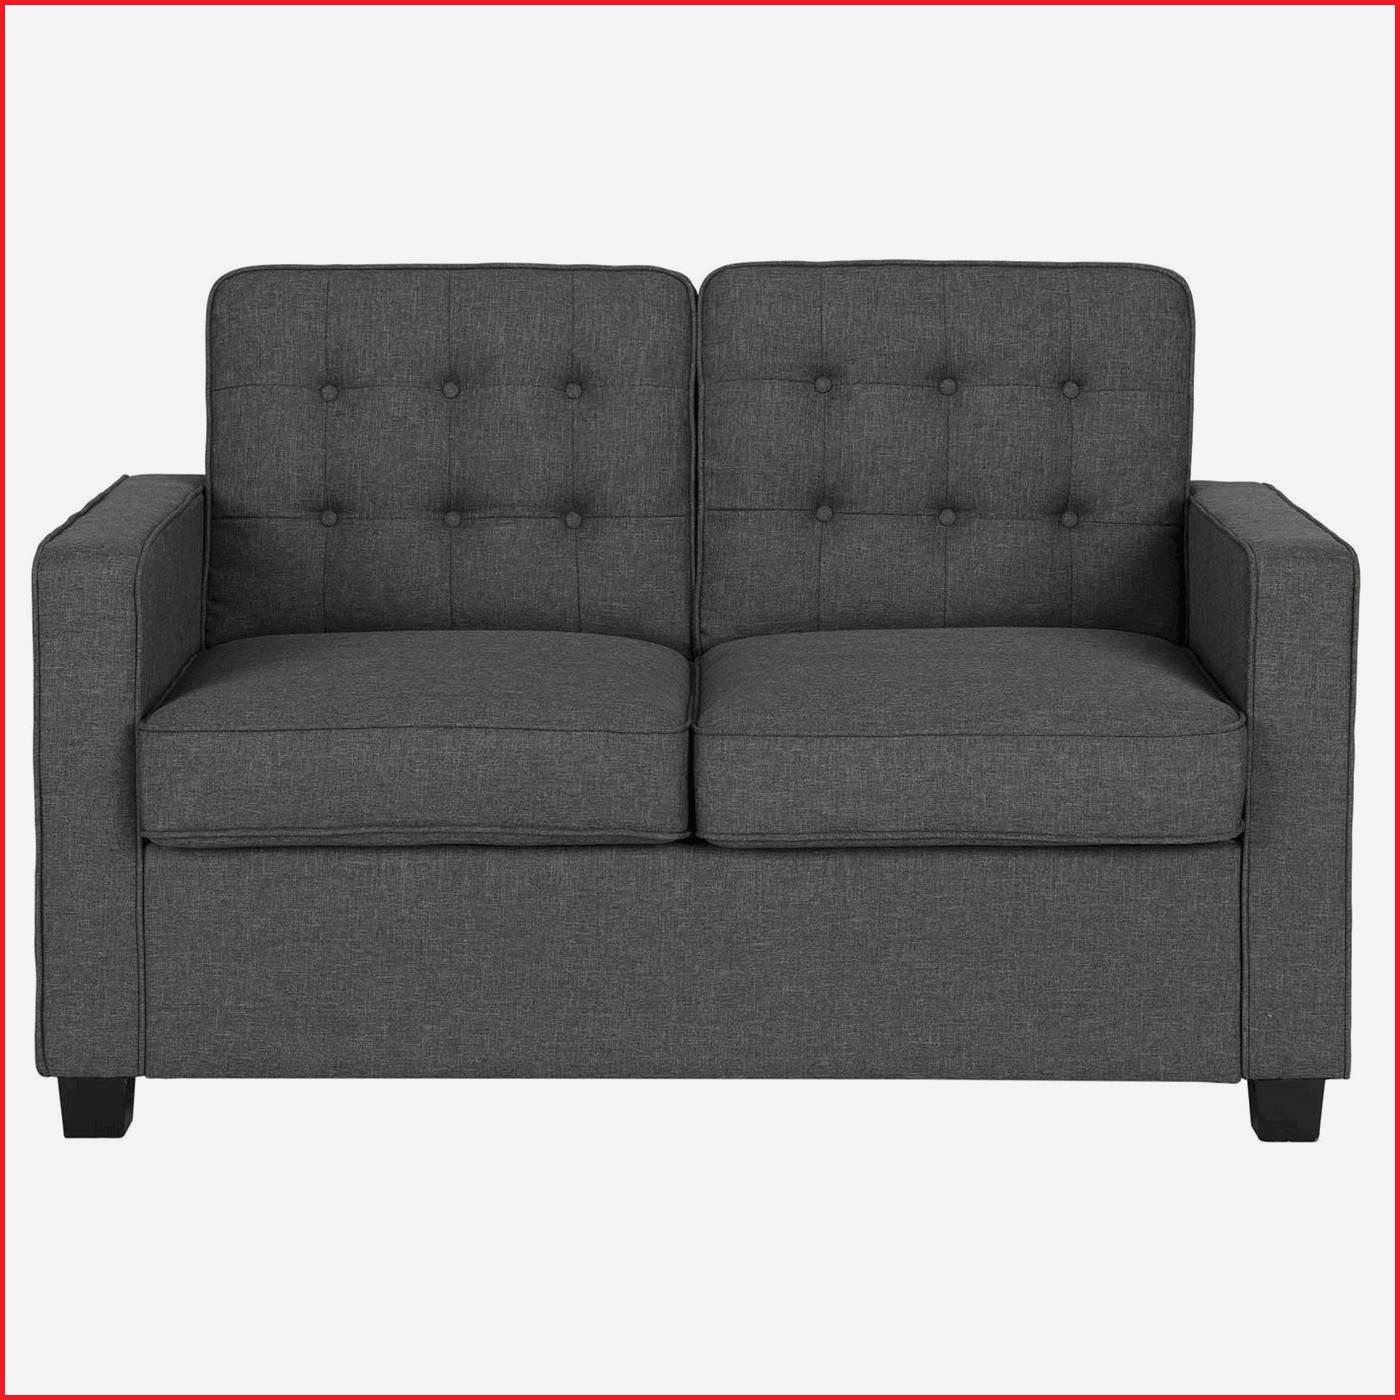 Sofas Cama Ikea 2017 Bqdd Conforama sofa Cama sofas Conforama 2017 sofa Cama Barato